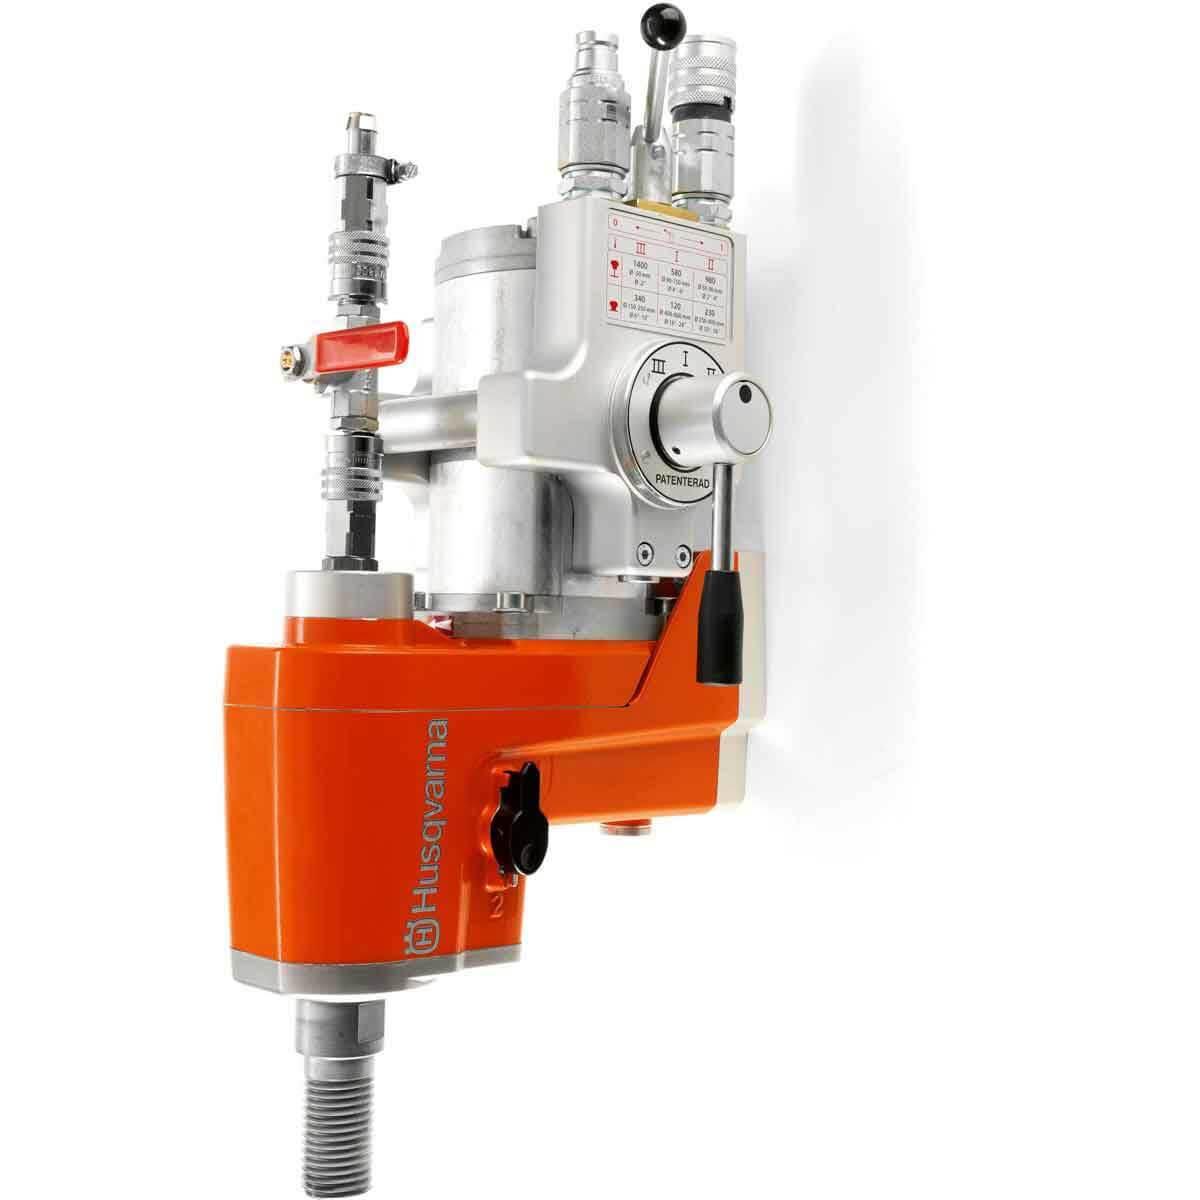 Husqvarna DM 406 H hydraulic motor